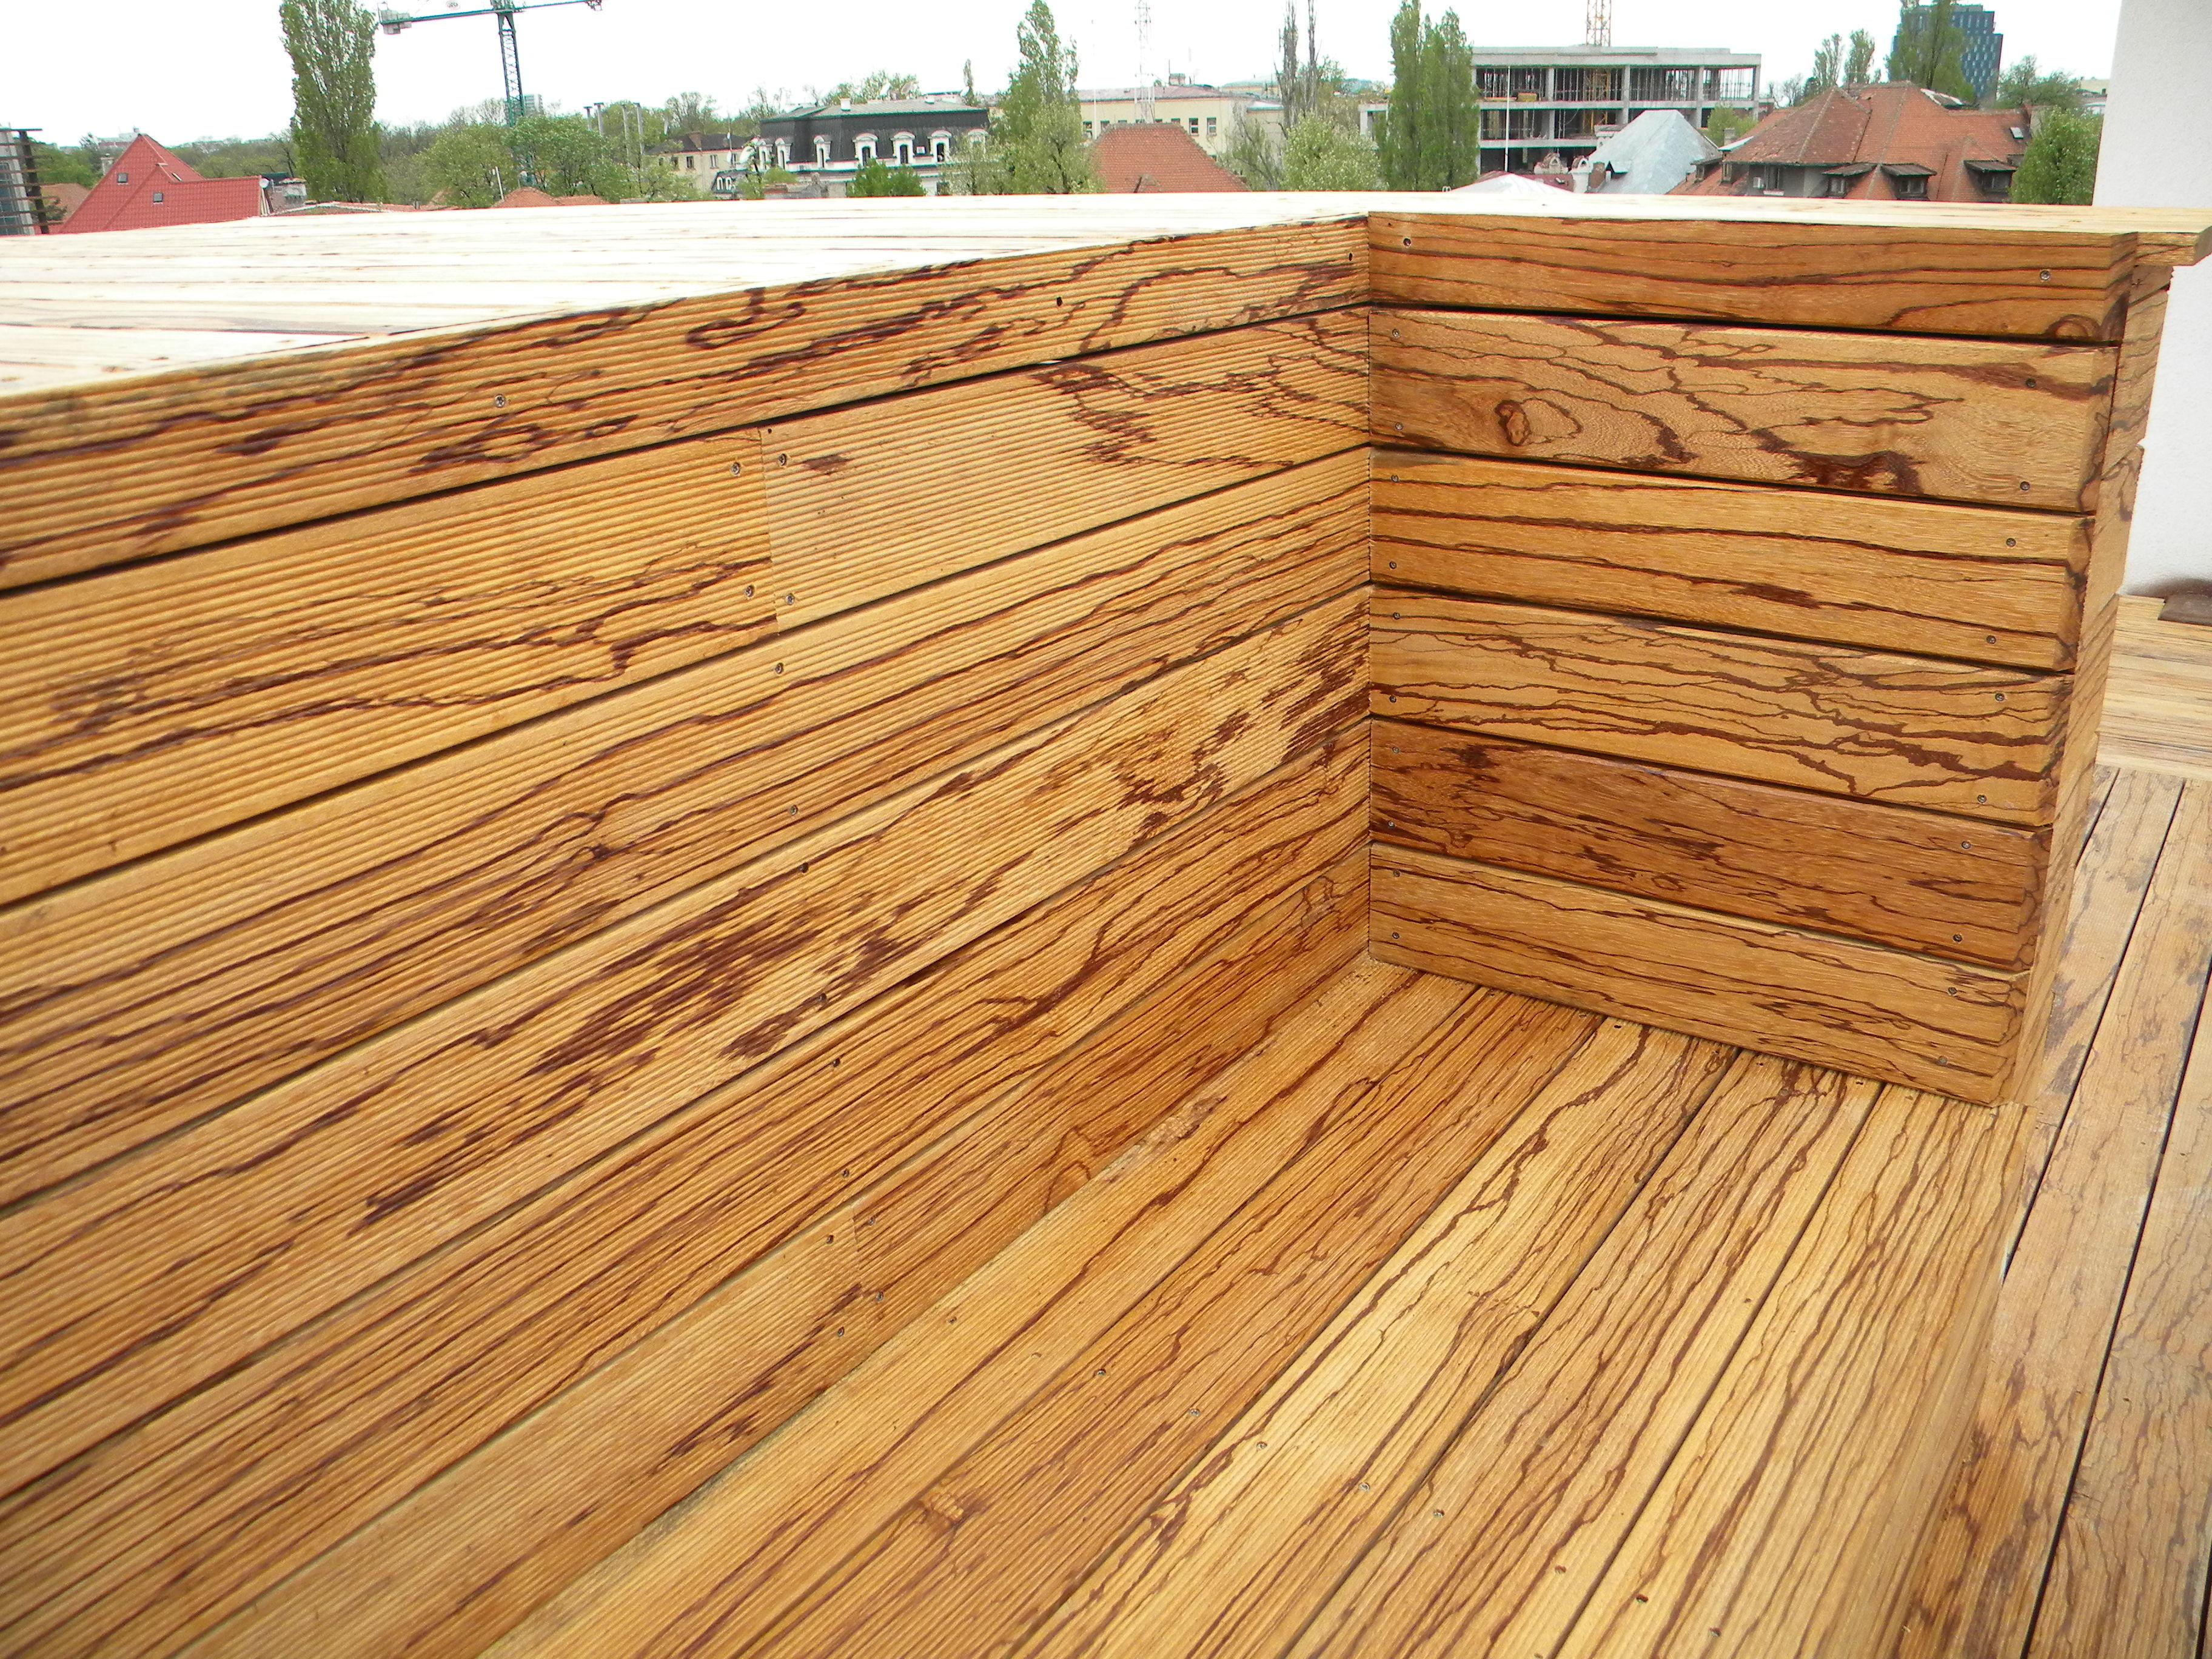 Deck-uri lemn - Angelim Rajado SELVA FLOORS - Poza 10